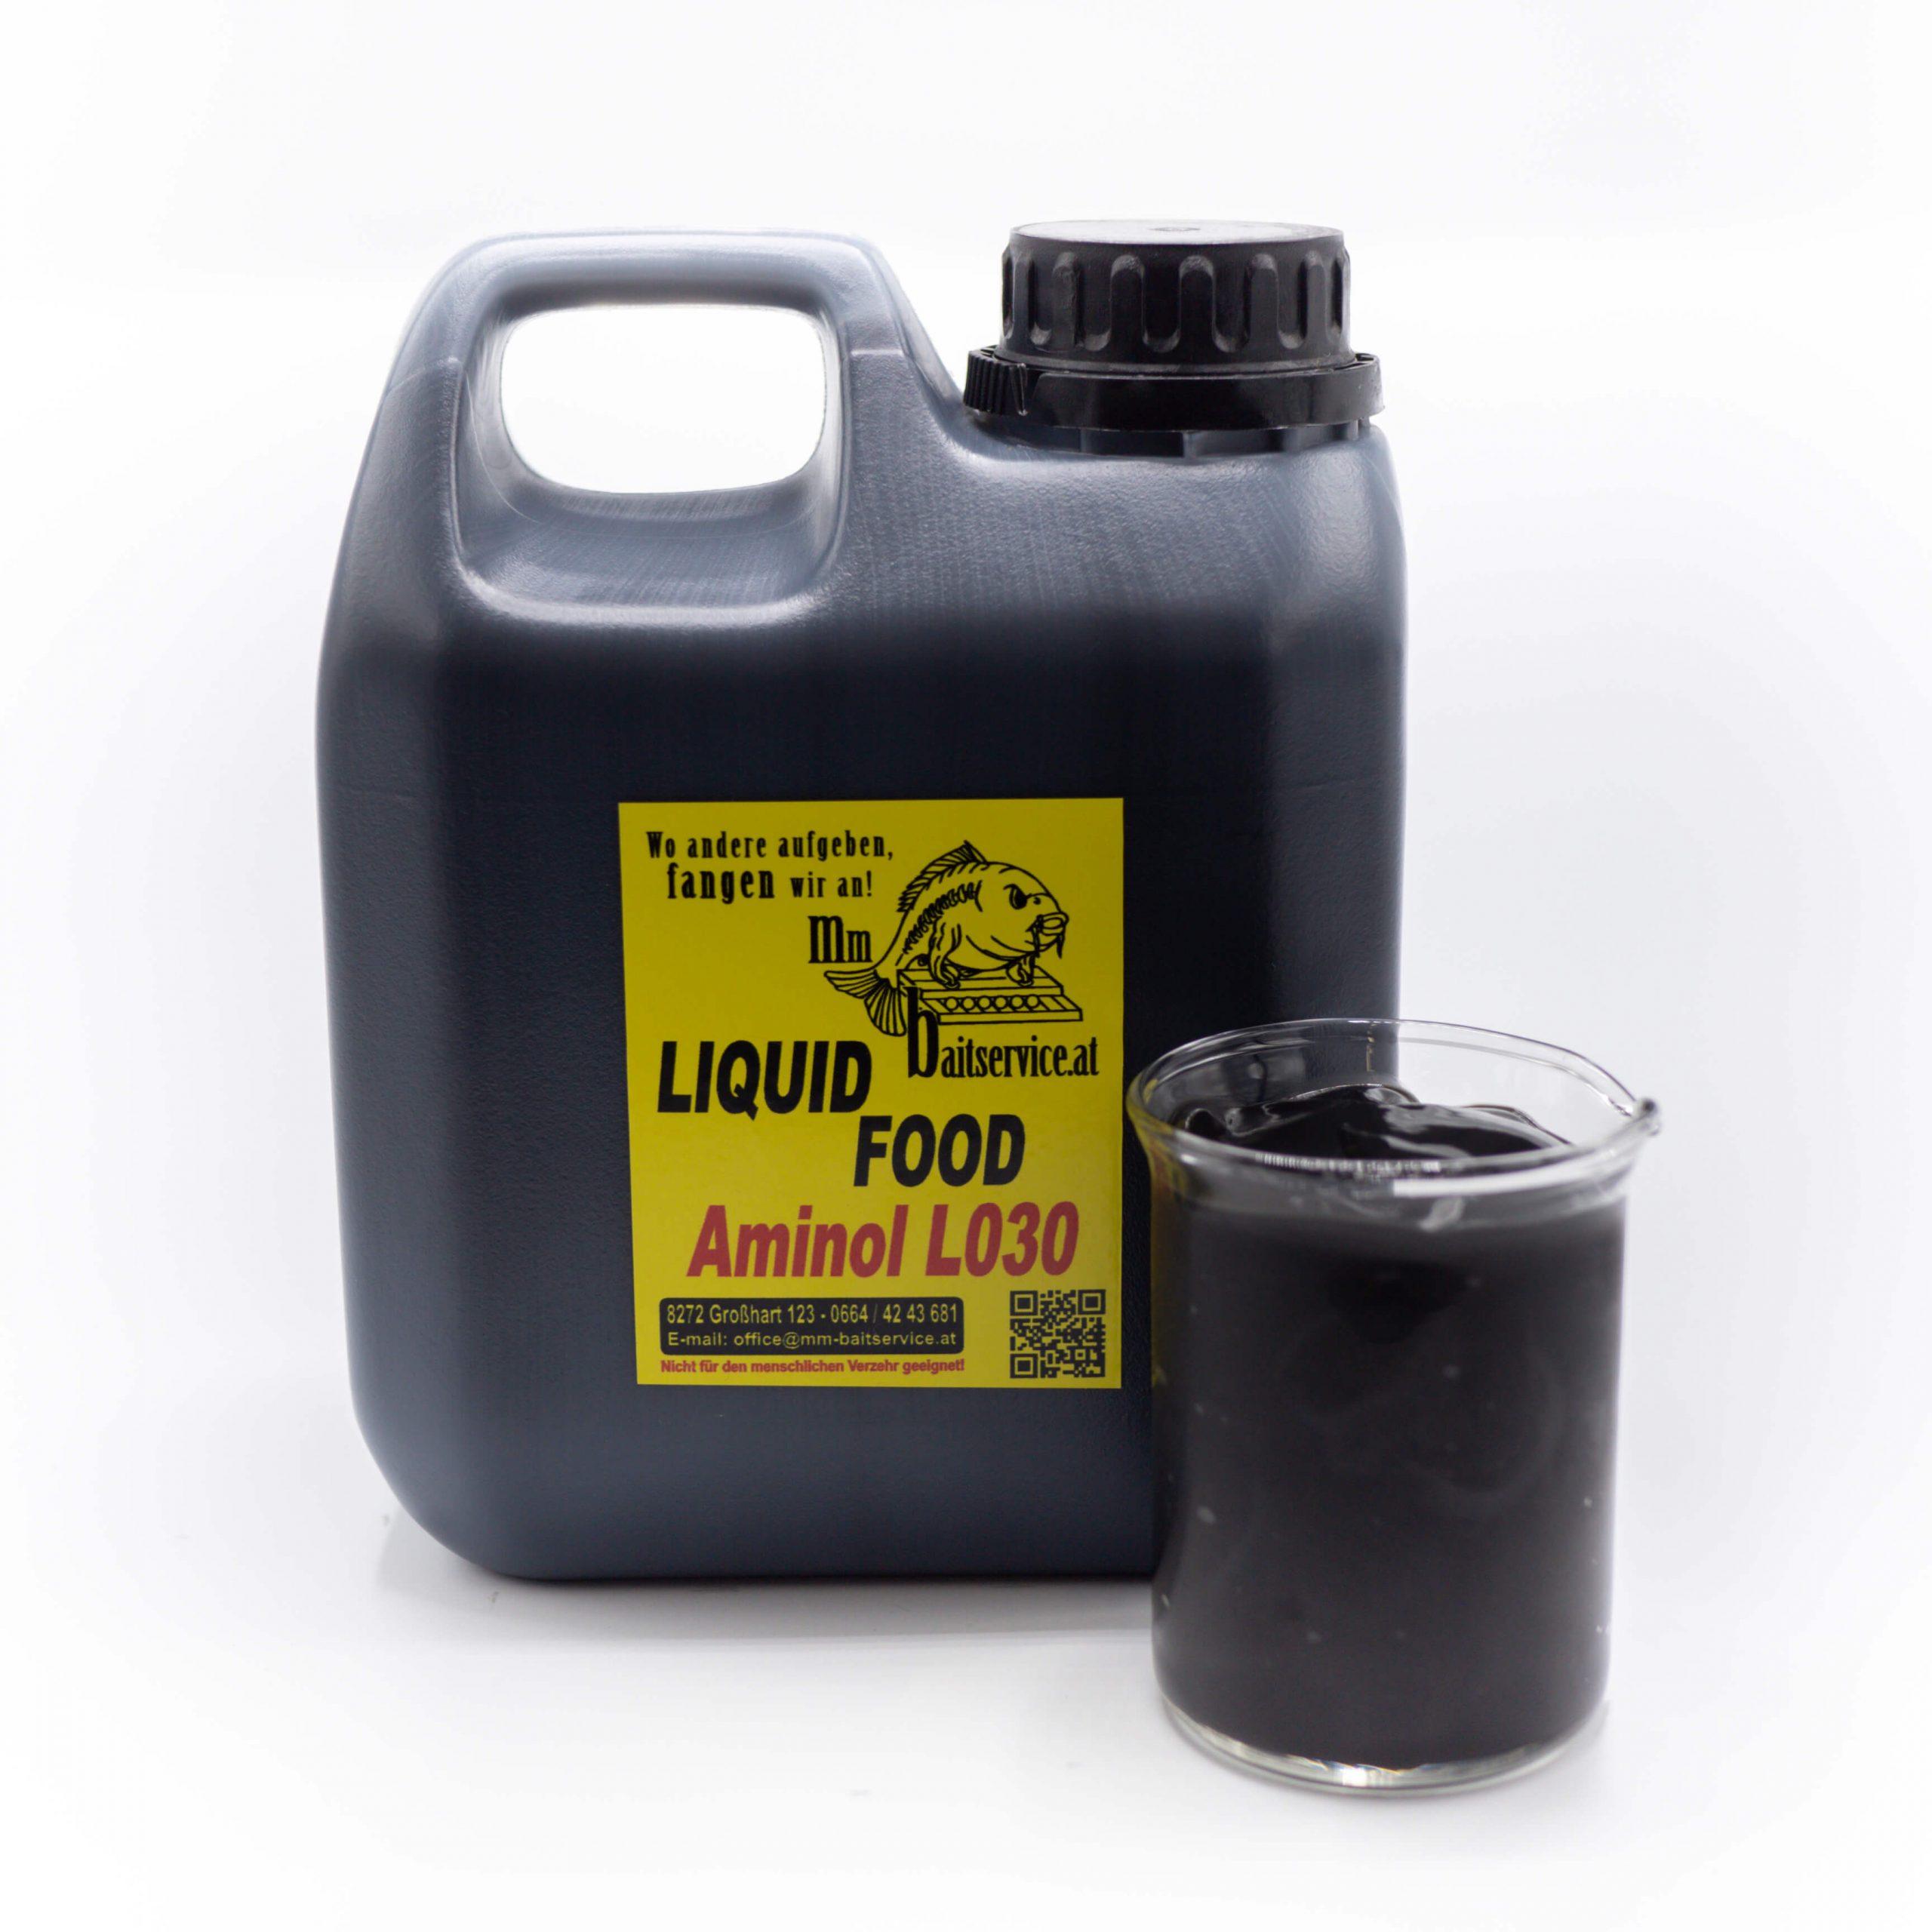 Aminol L030 - Liquid